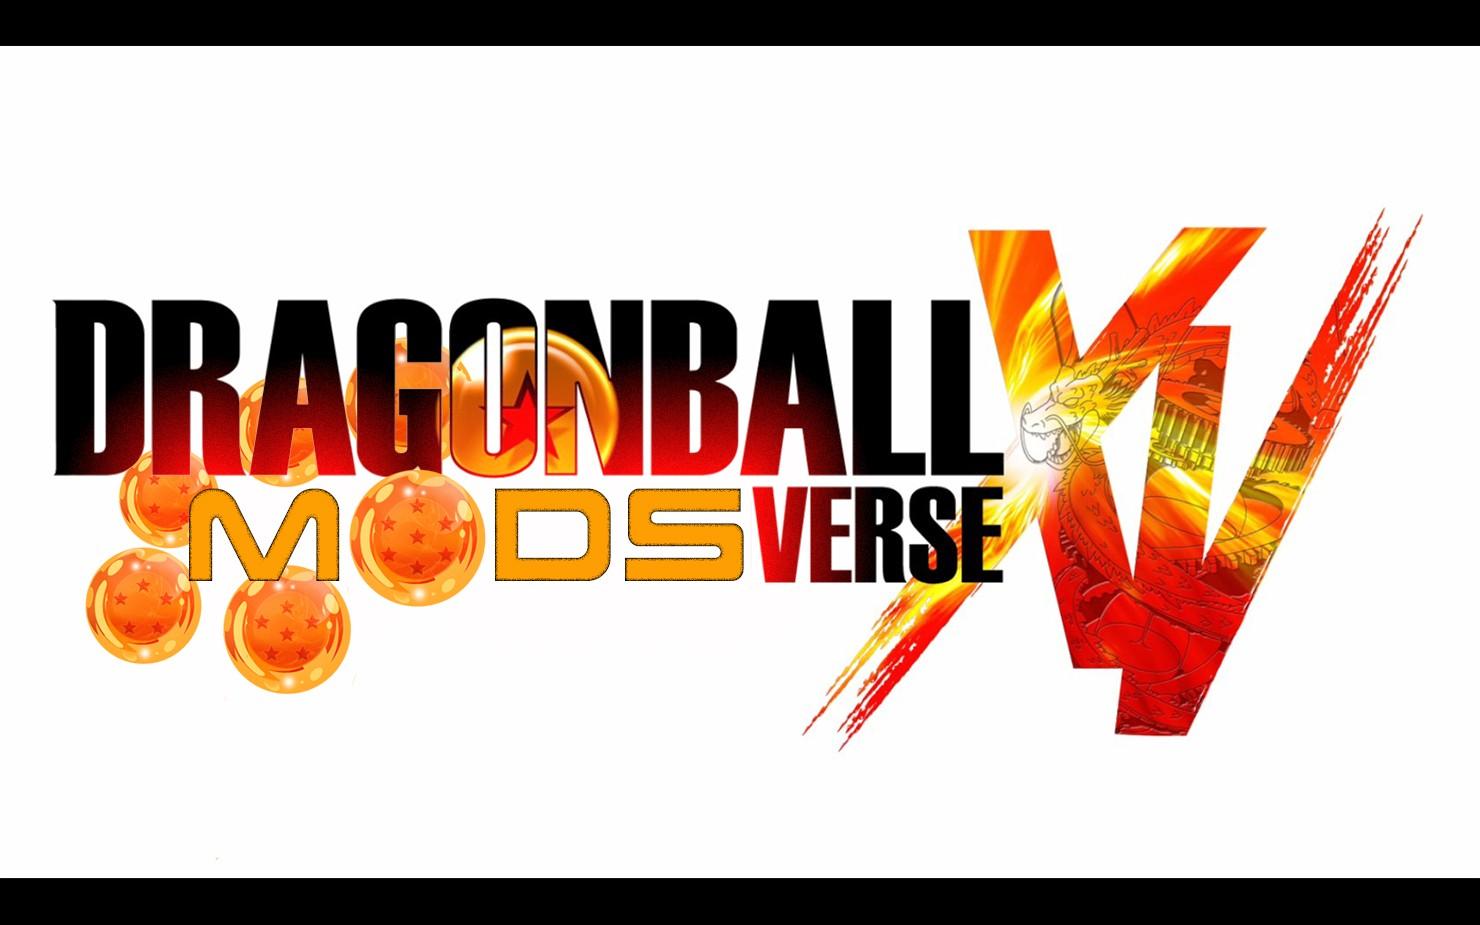 Dragon Ball Modsverse